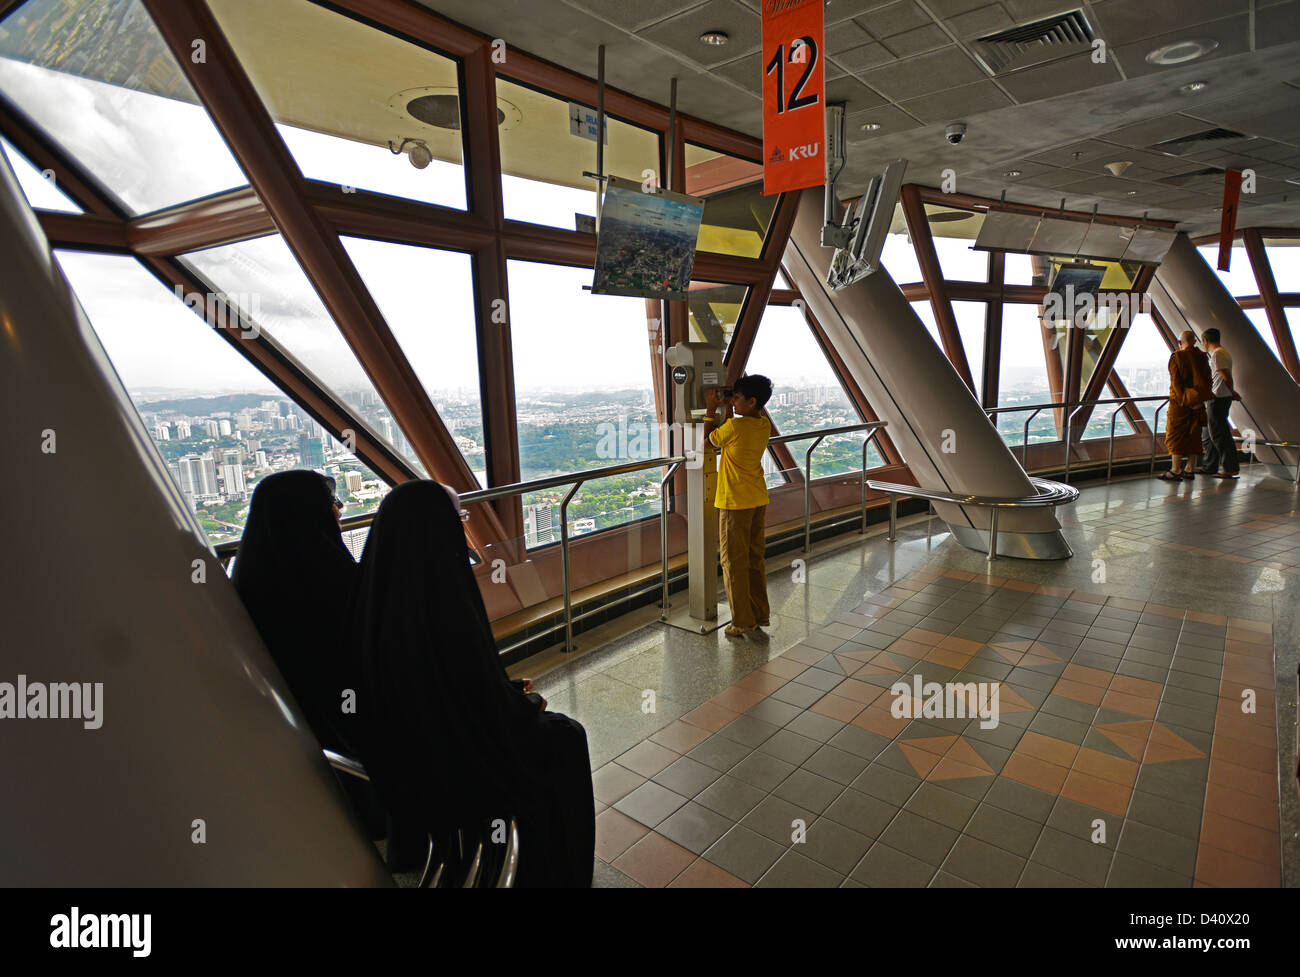 Asia Malaysia Kuala Lumpur KL Menara Tower - Stock Image